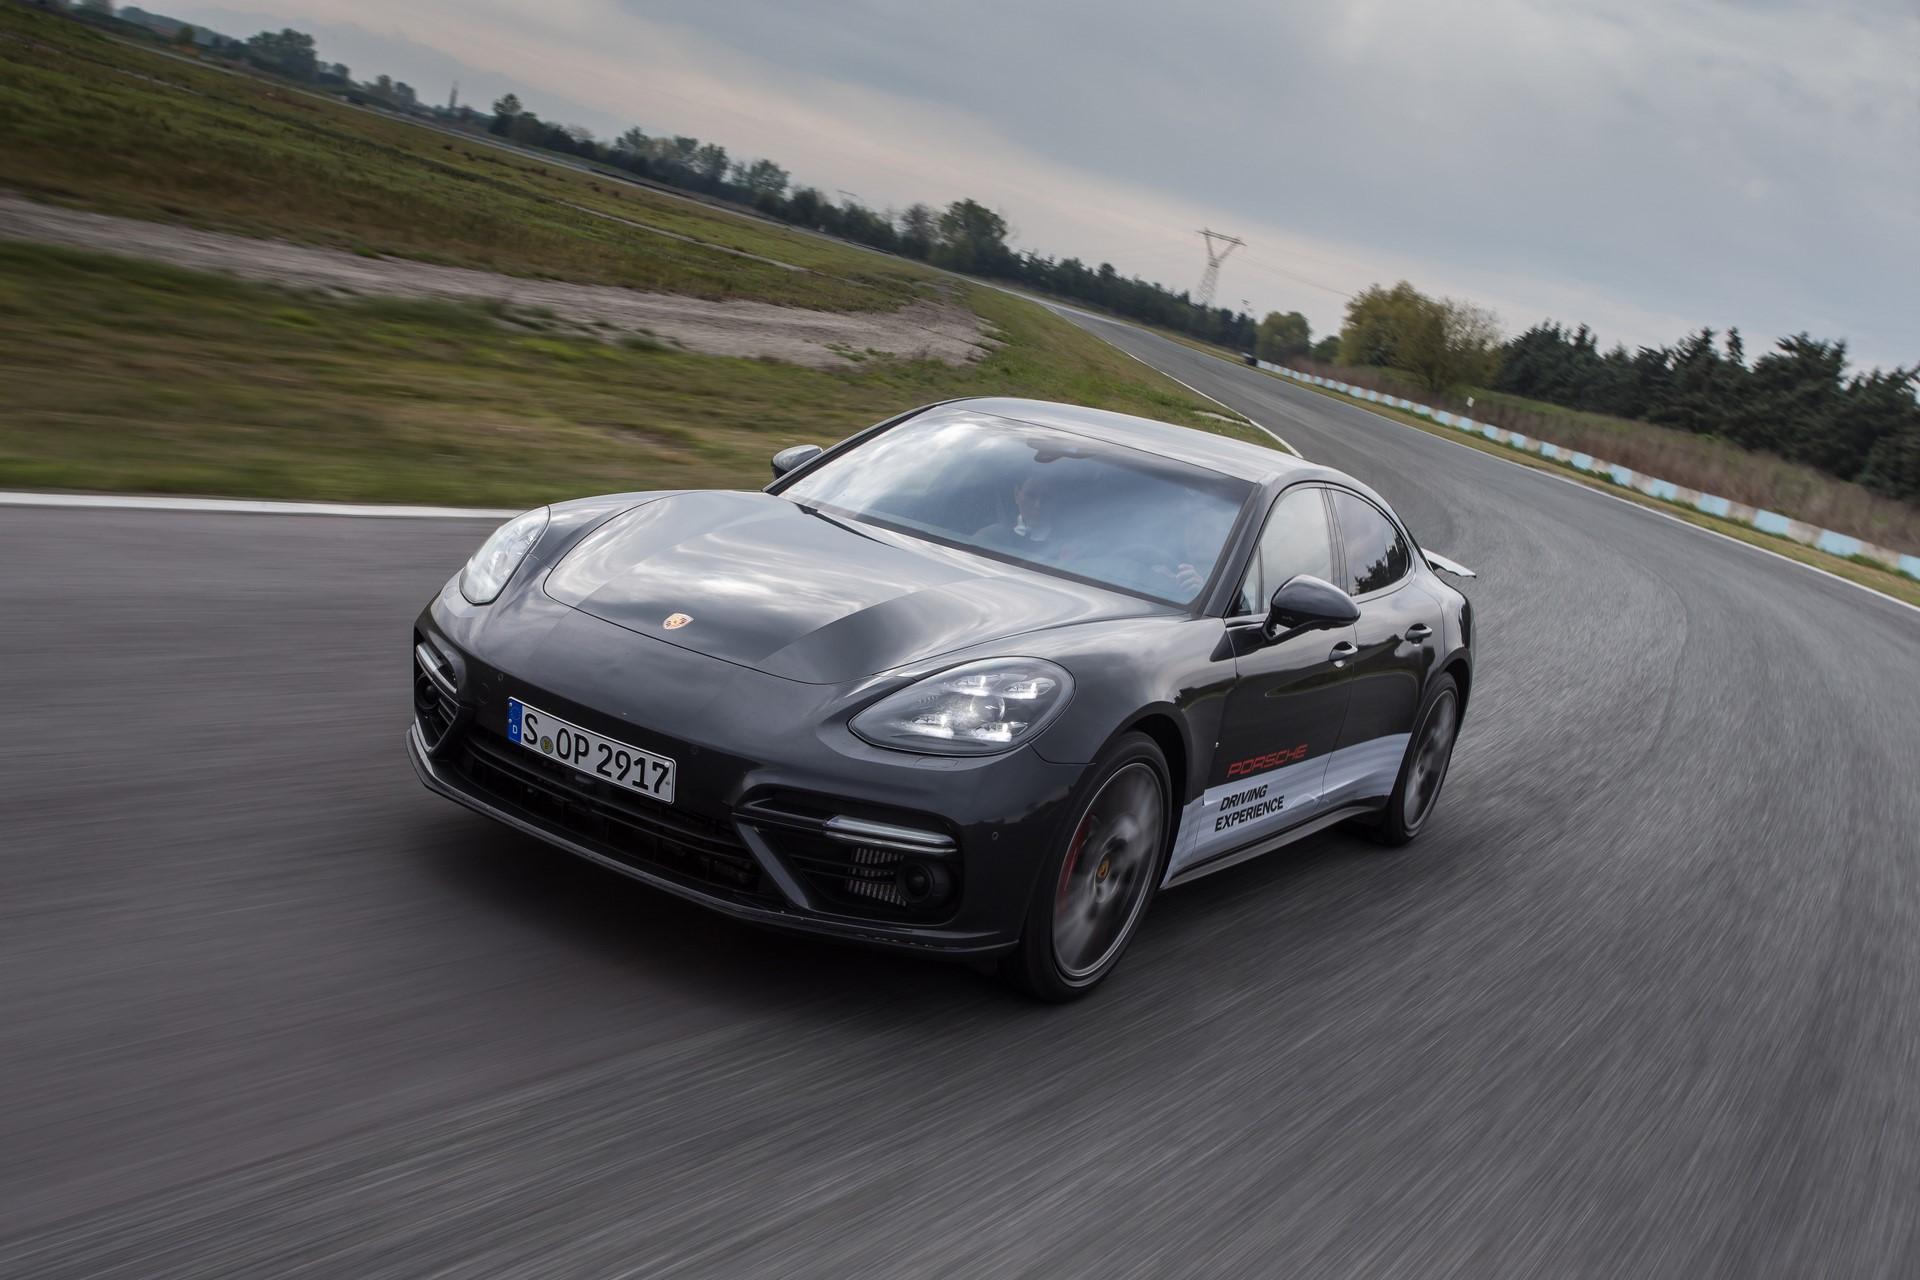 Porsche Driving Experience 2017 Serres (47)